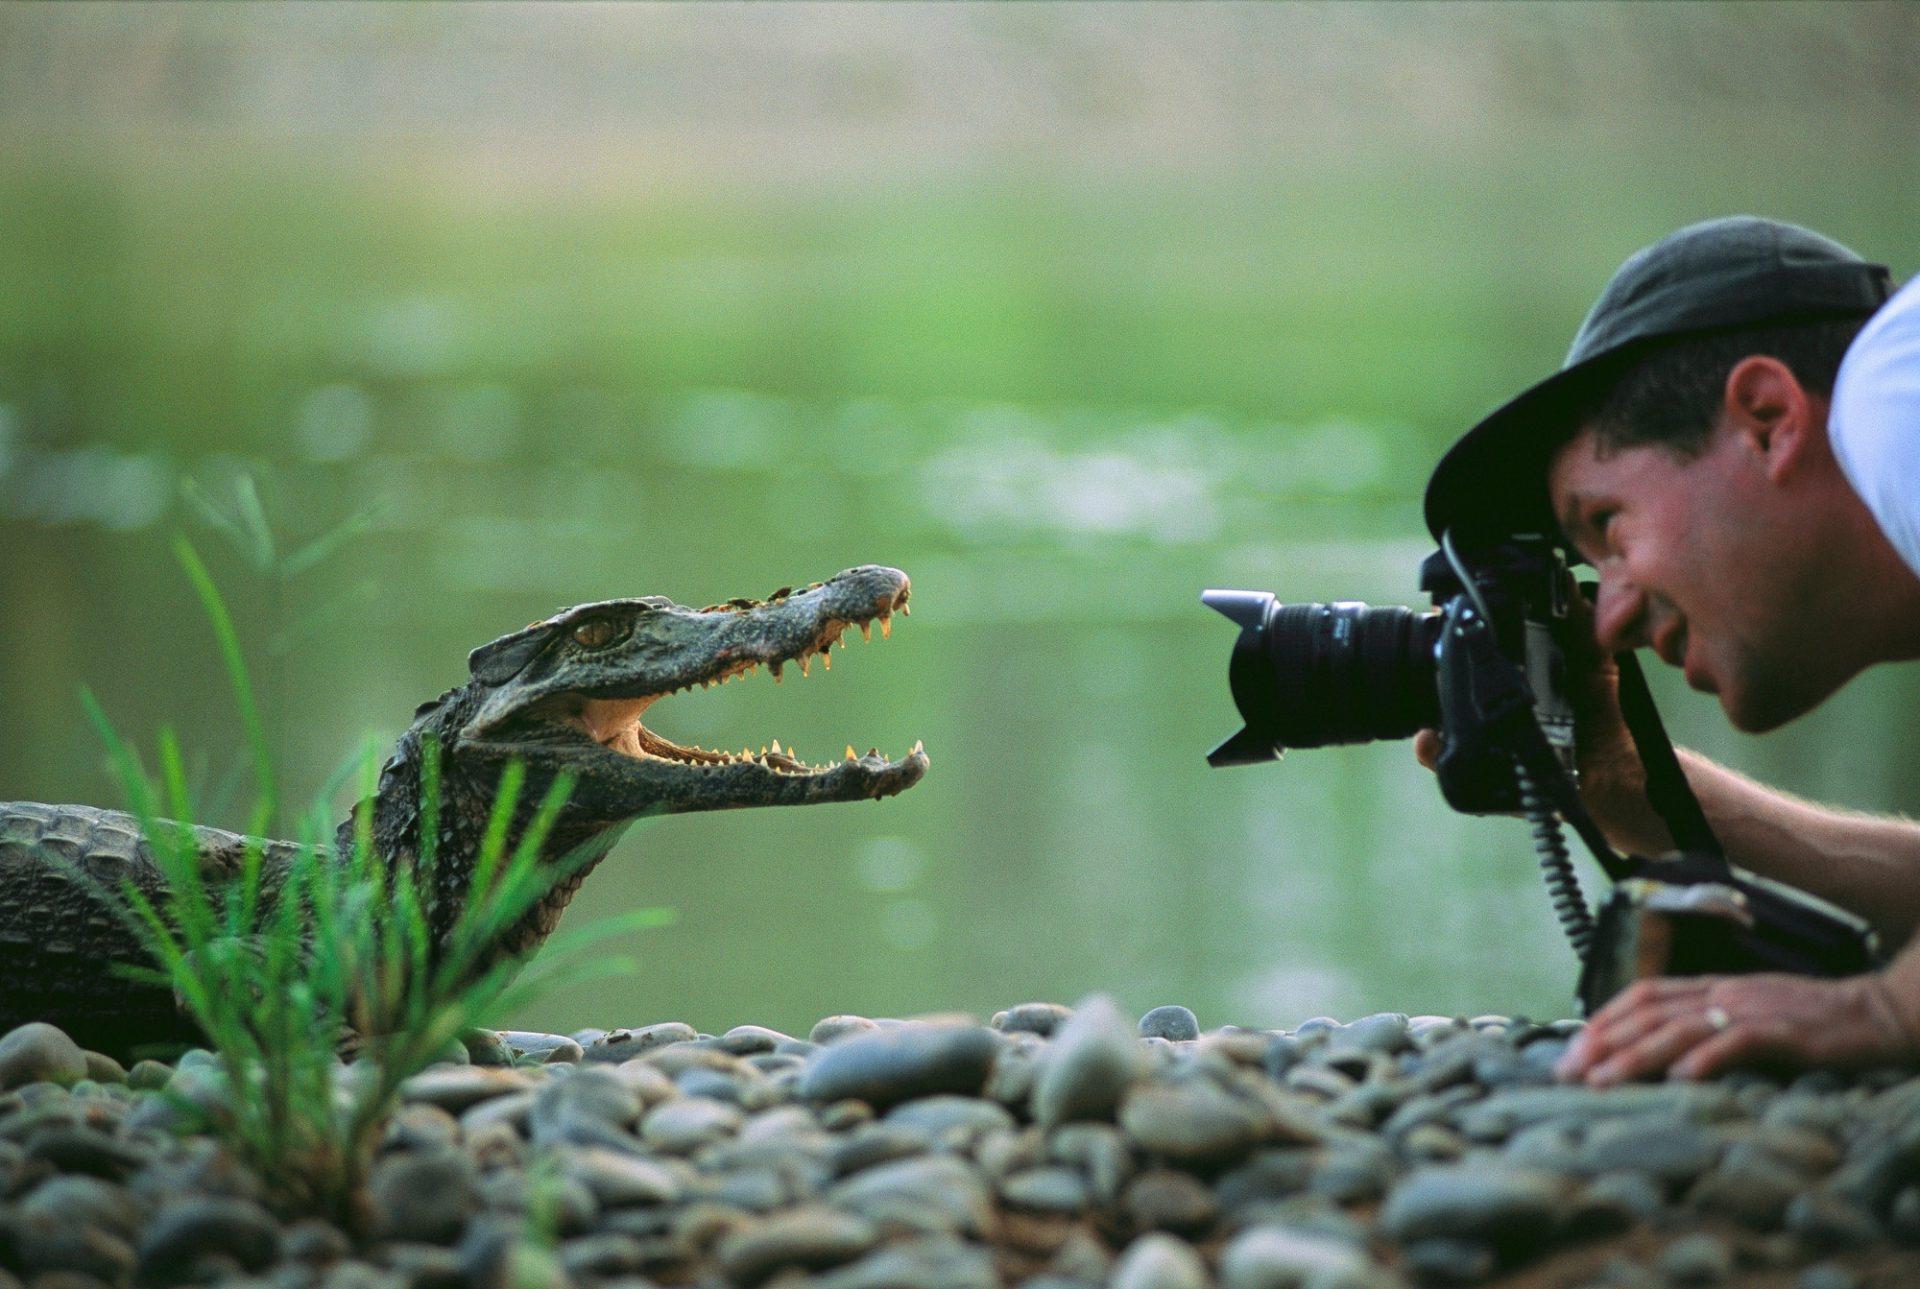 Photo: Photographer Joel Sartore inches his way toward a juvenile caiman in Bolivia's Madidi National Park.